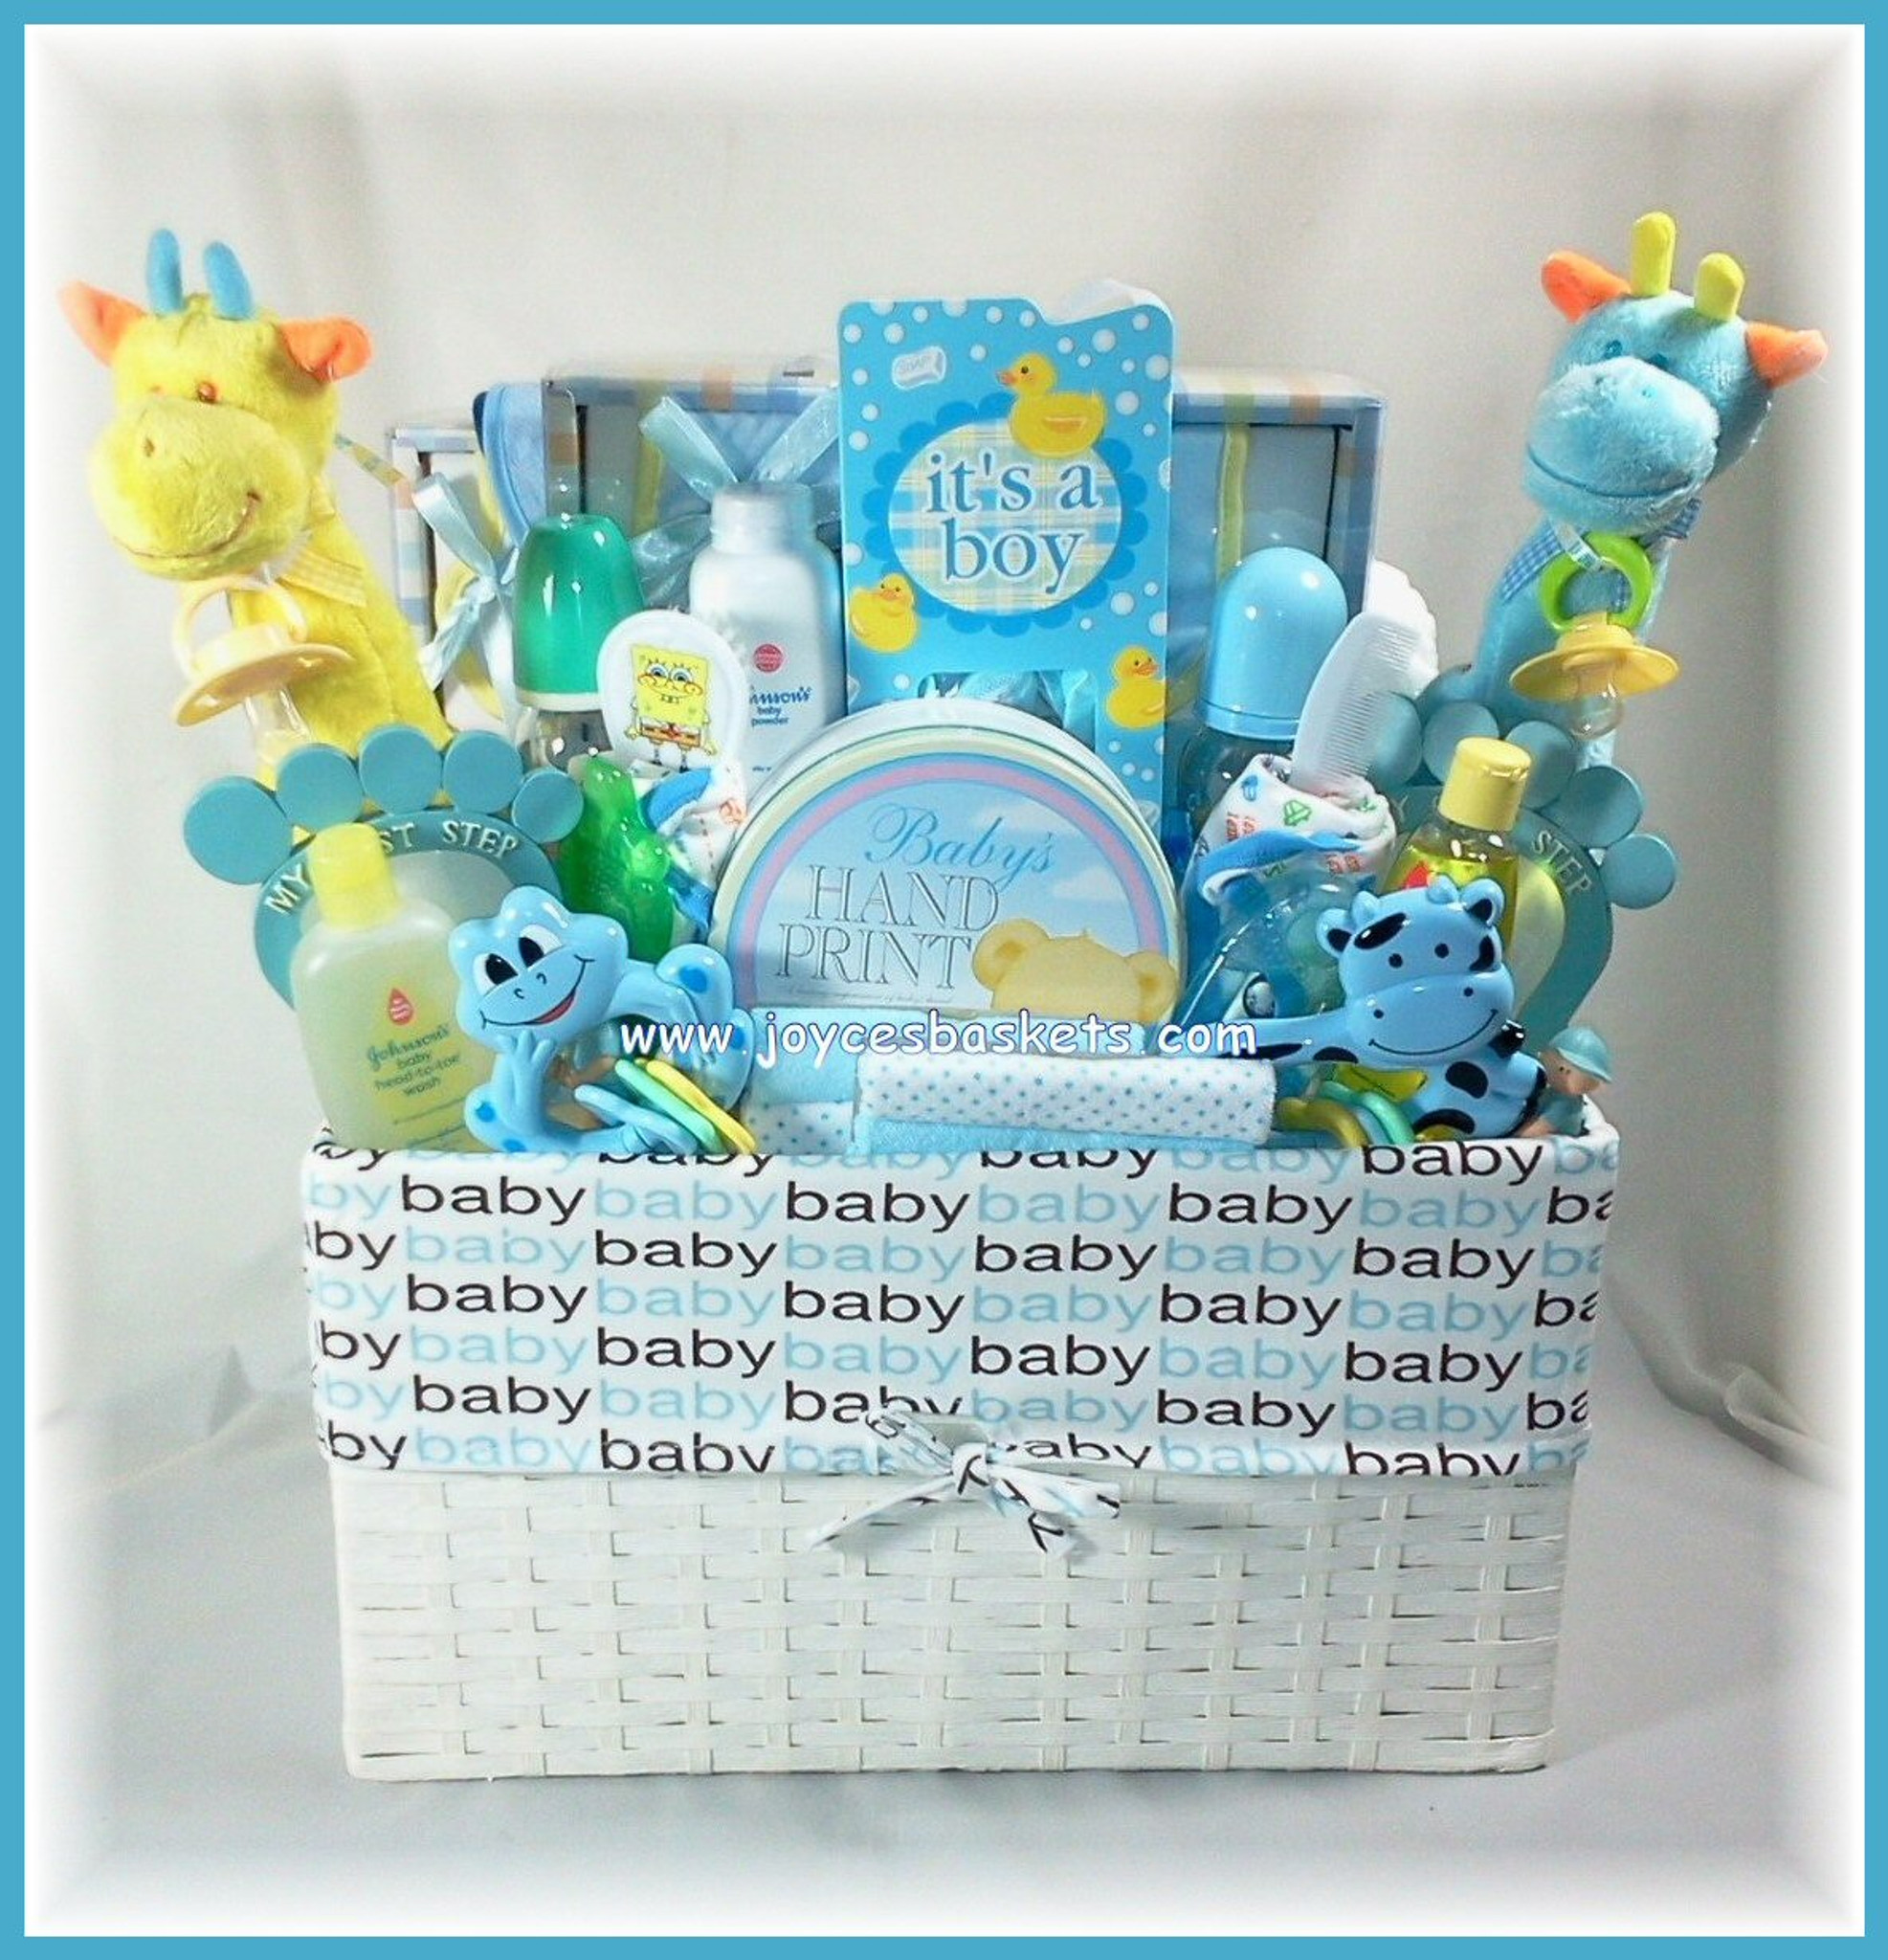 Twin Baby Boys - Gift Basket ...  sc 1 st  Joyceu0027s Baskets & Twin Baby Boys Gift Basket in Miami by Joyceu0027s Baskets